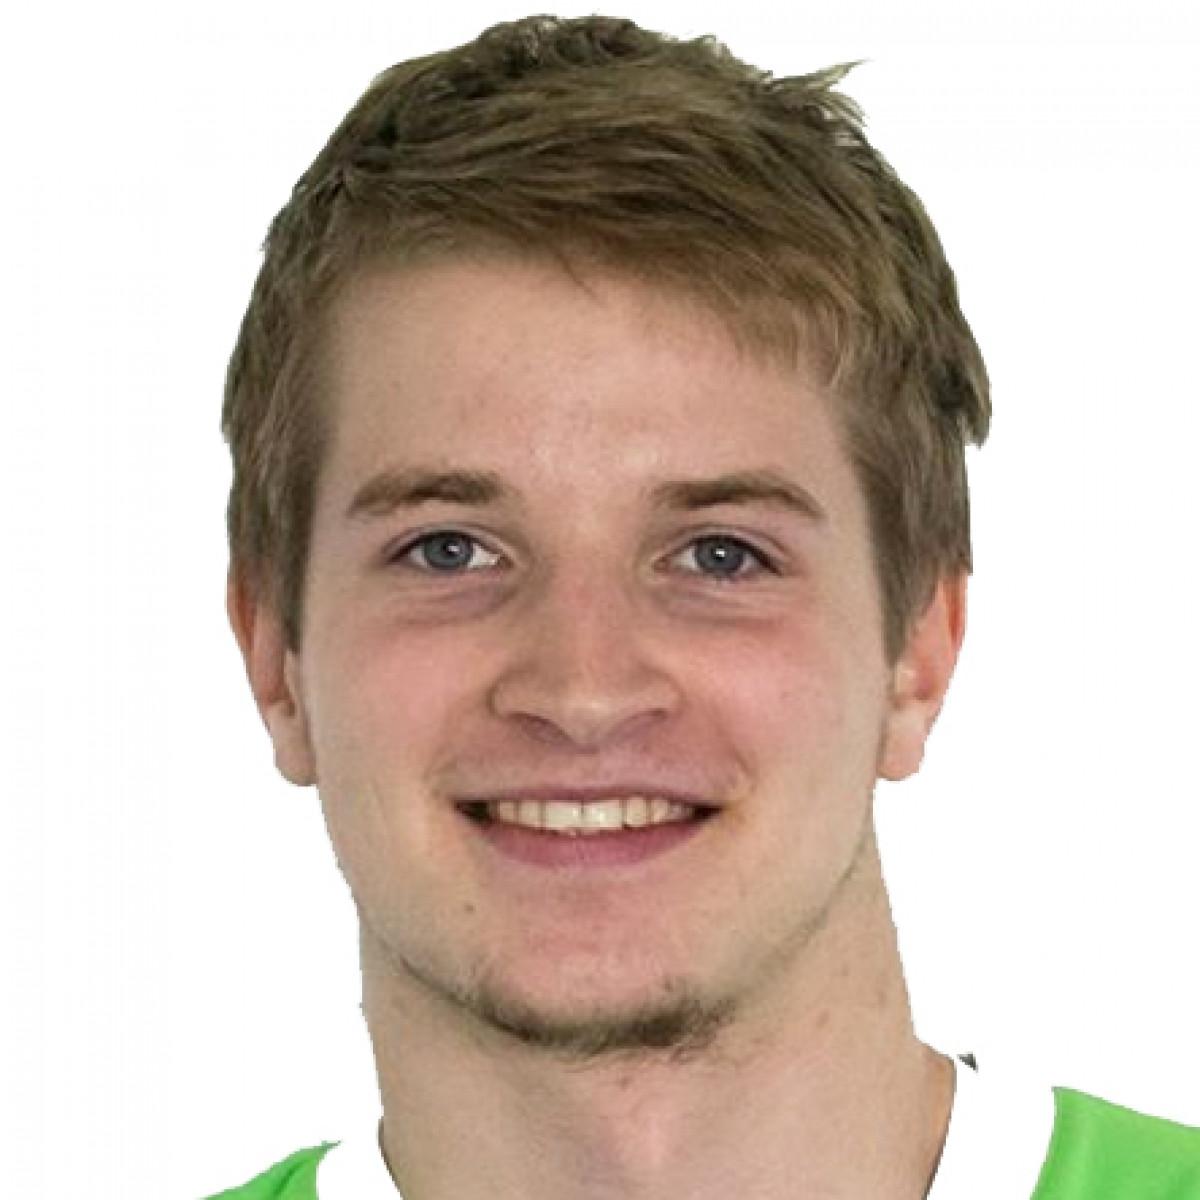 Mateusz Szczypinski